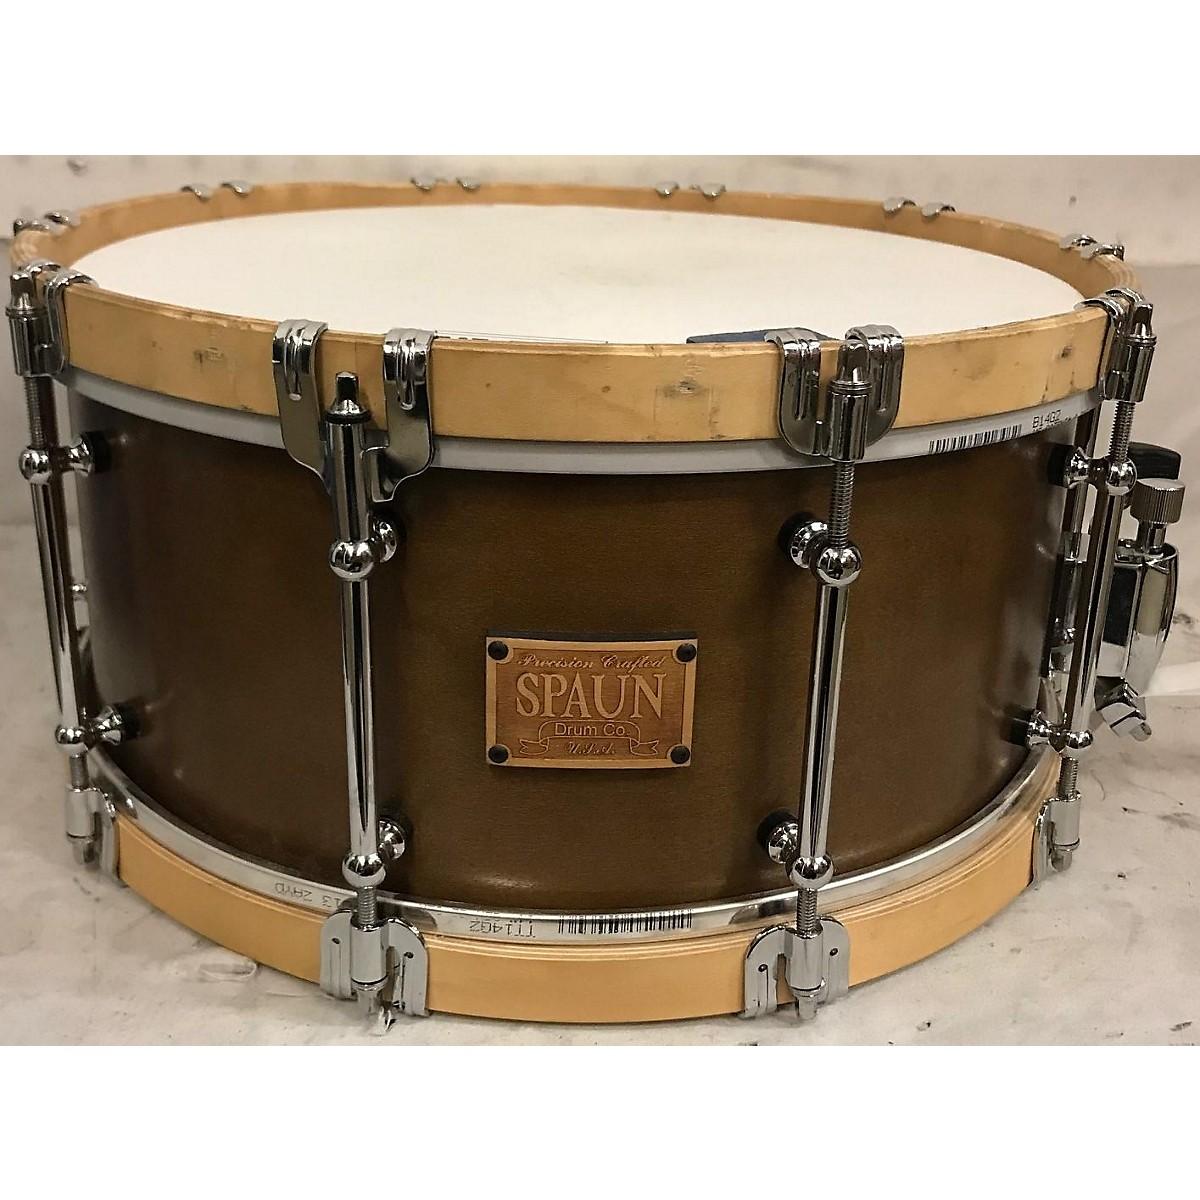 Spaun 6.5X14 Revolutionary Wood Hoop Snare Drum